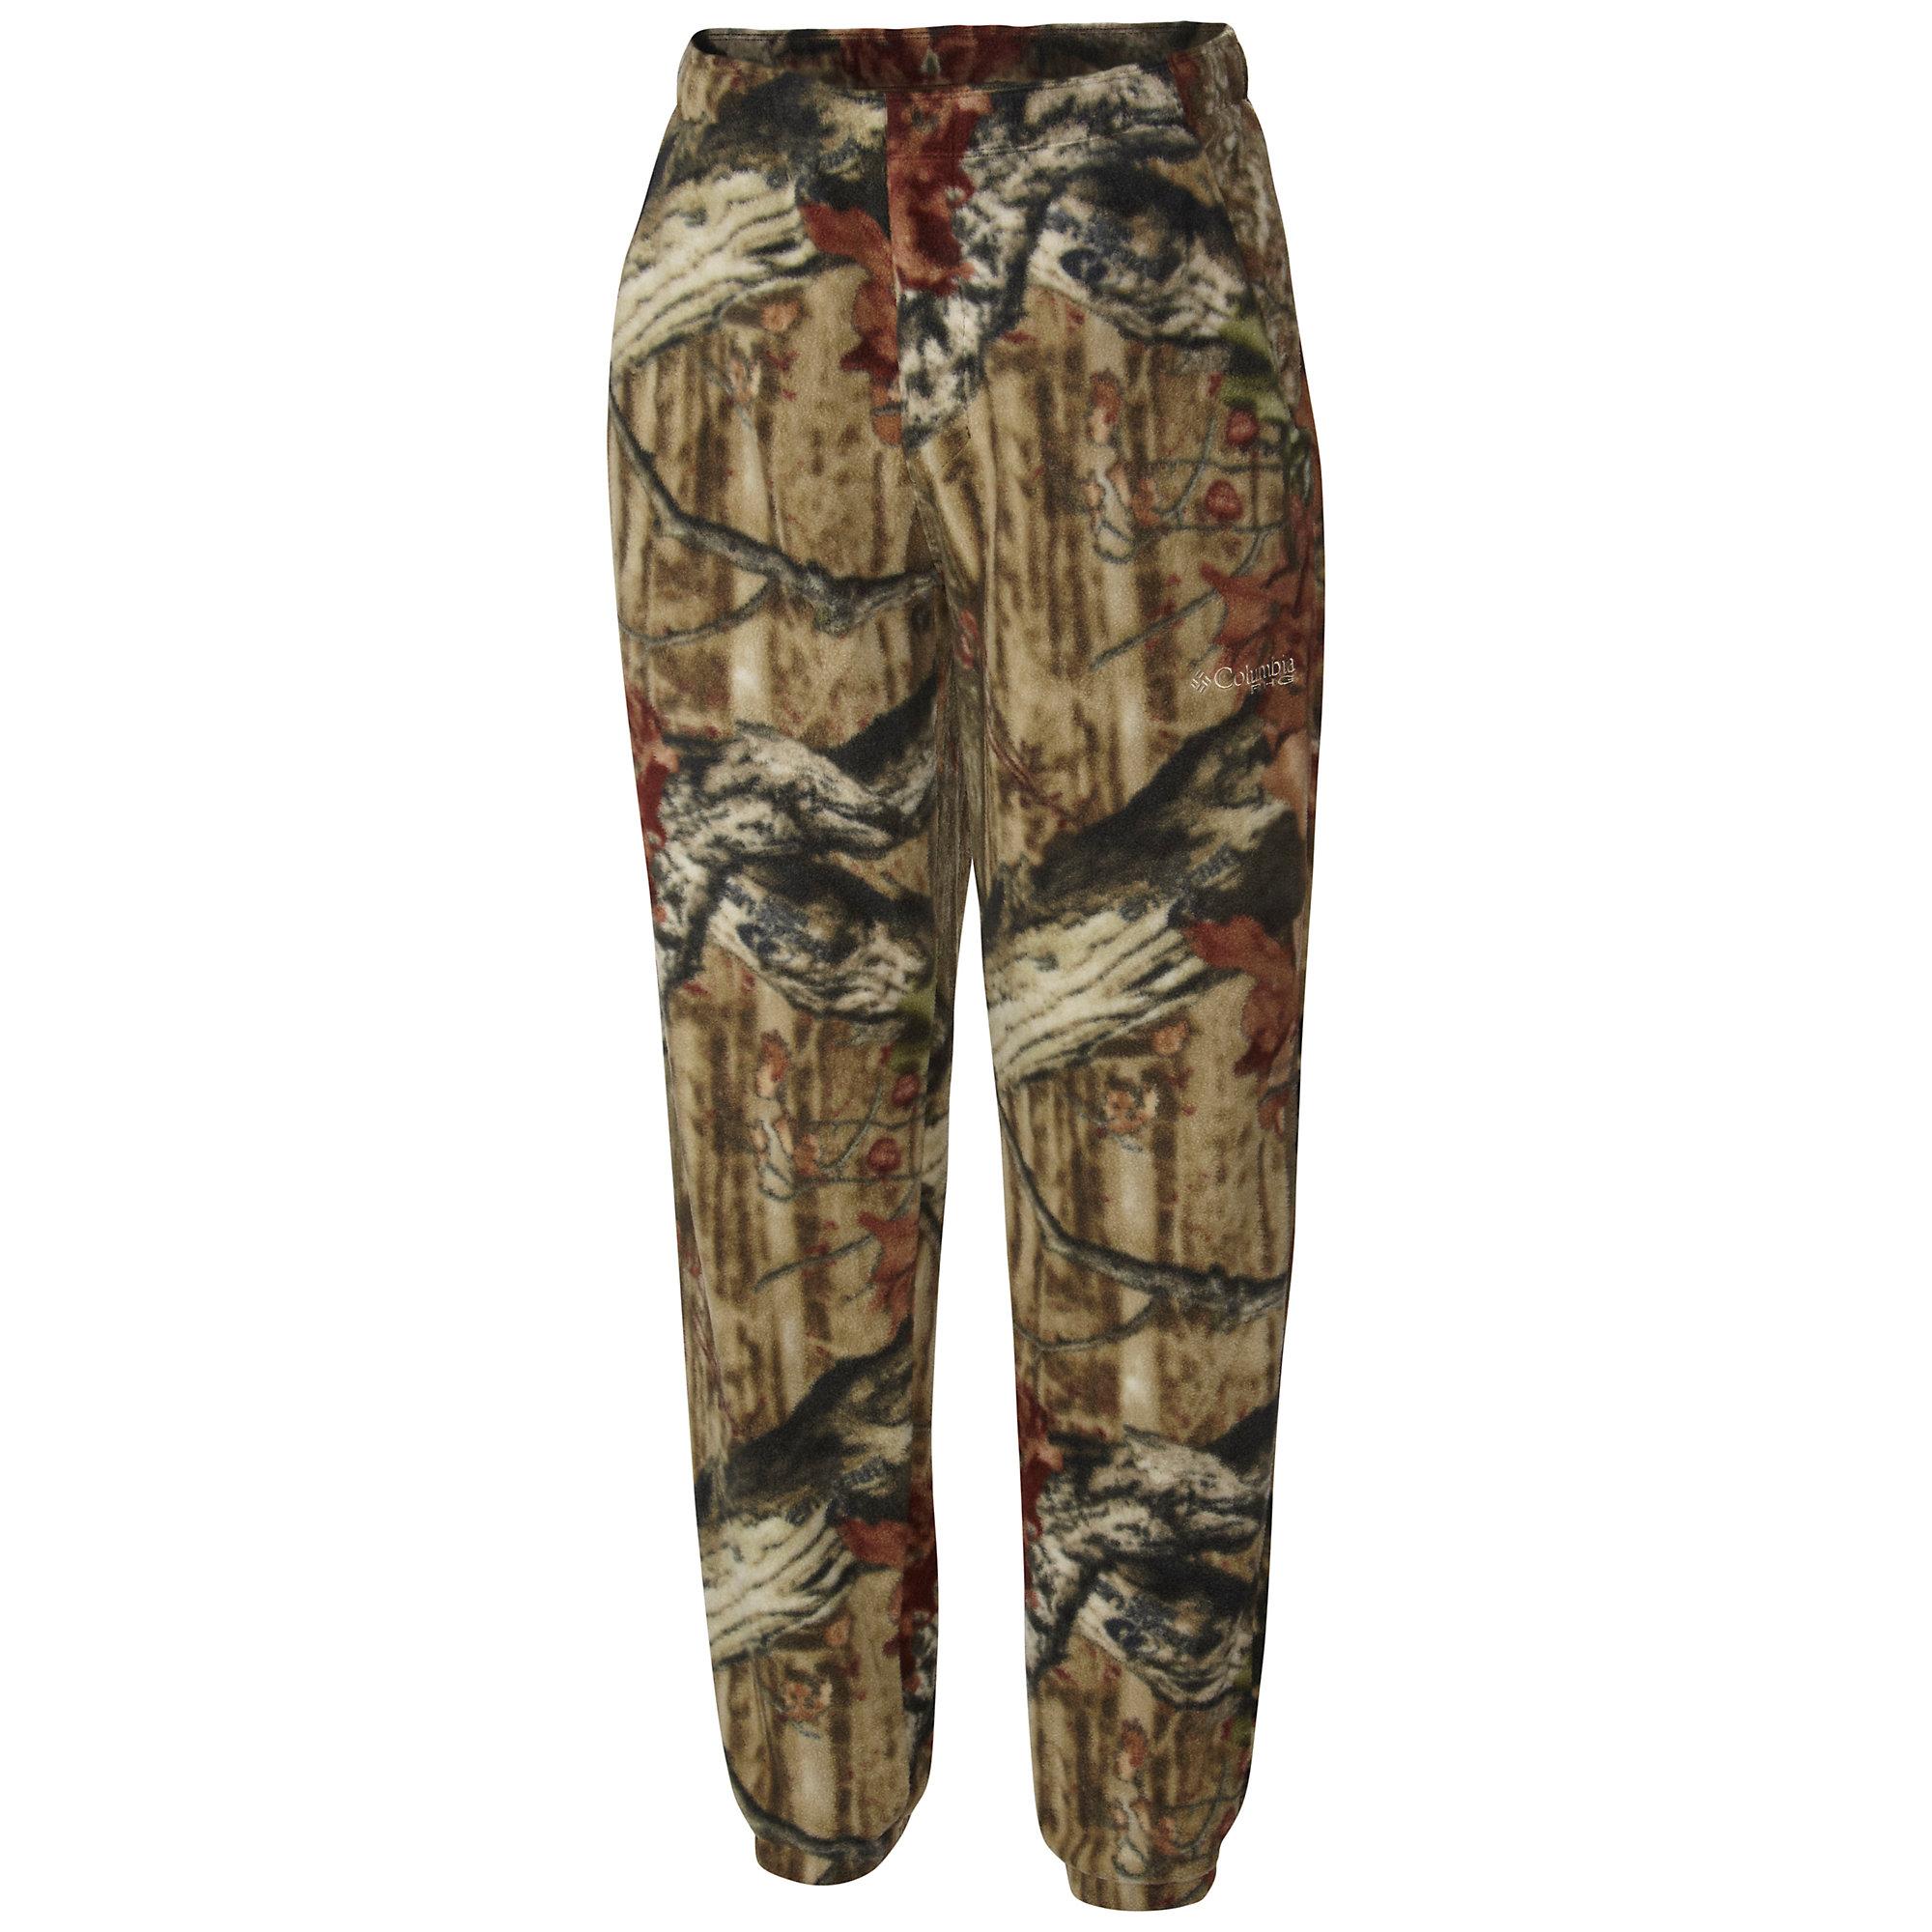 Columbia PHG Camo Fleece Pant